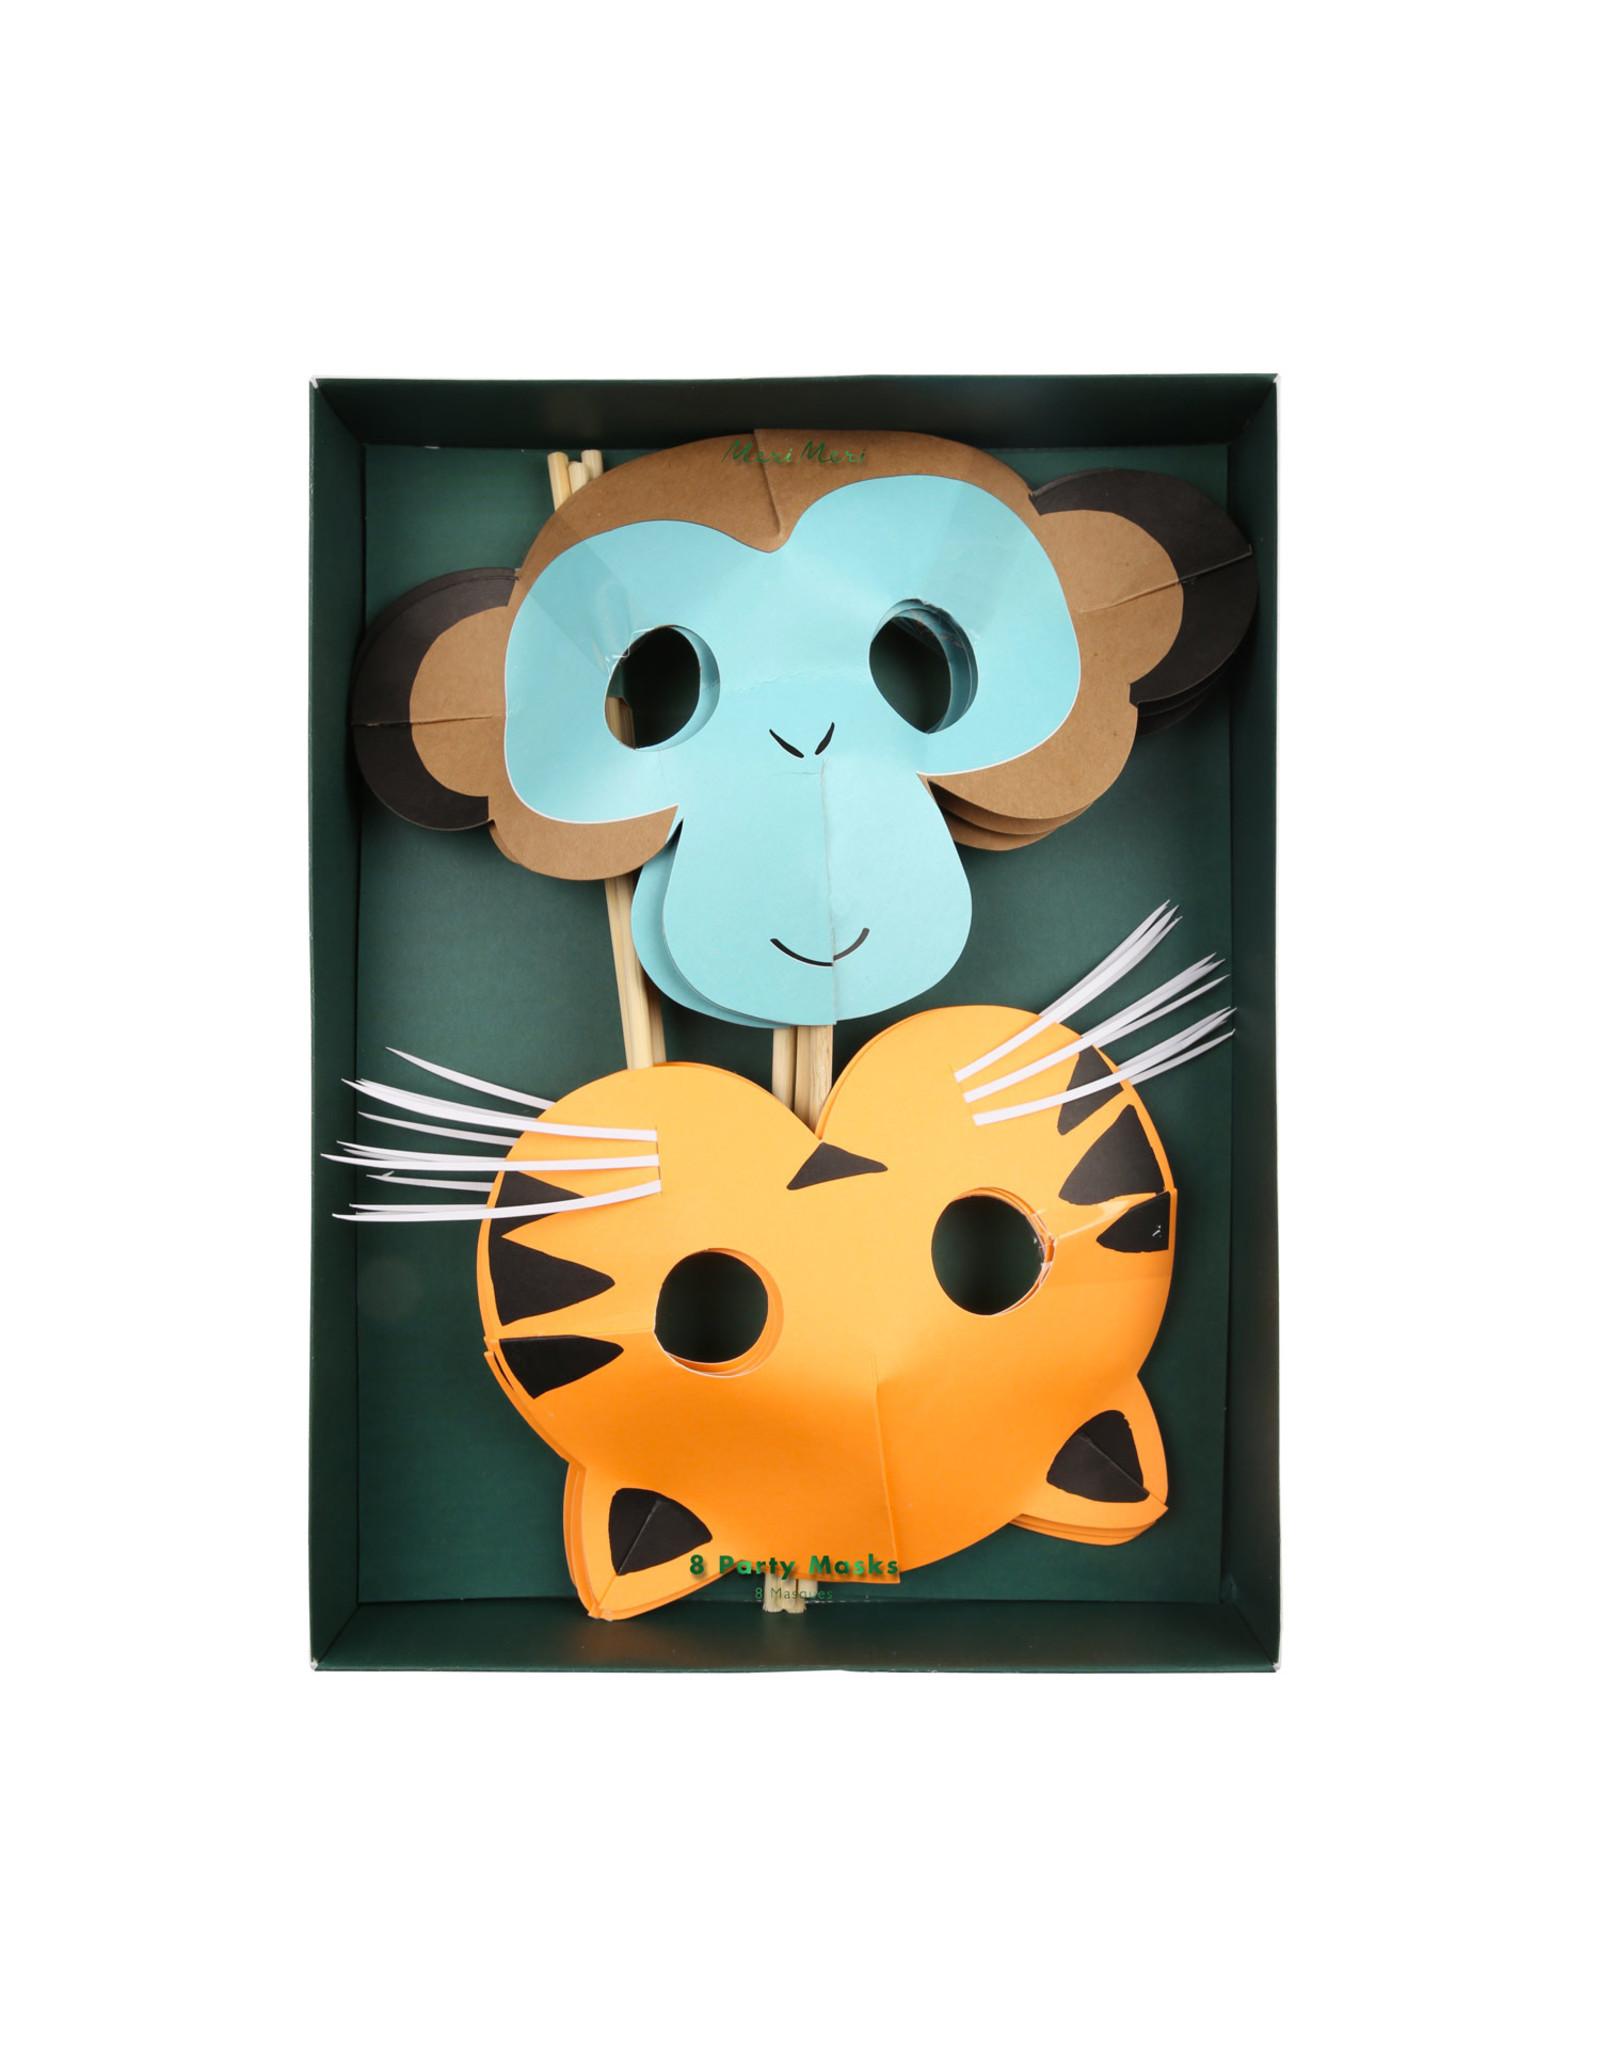 Meri Meri Go Wild Jungle Party Masks